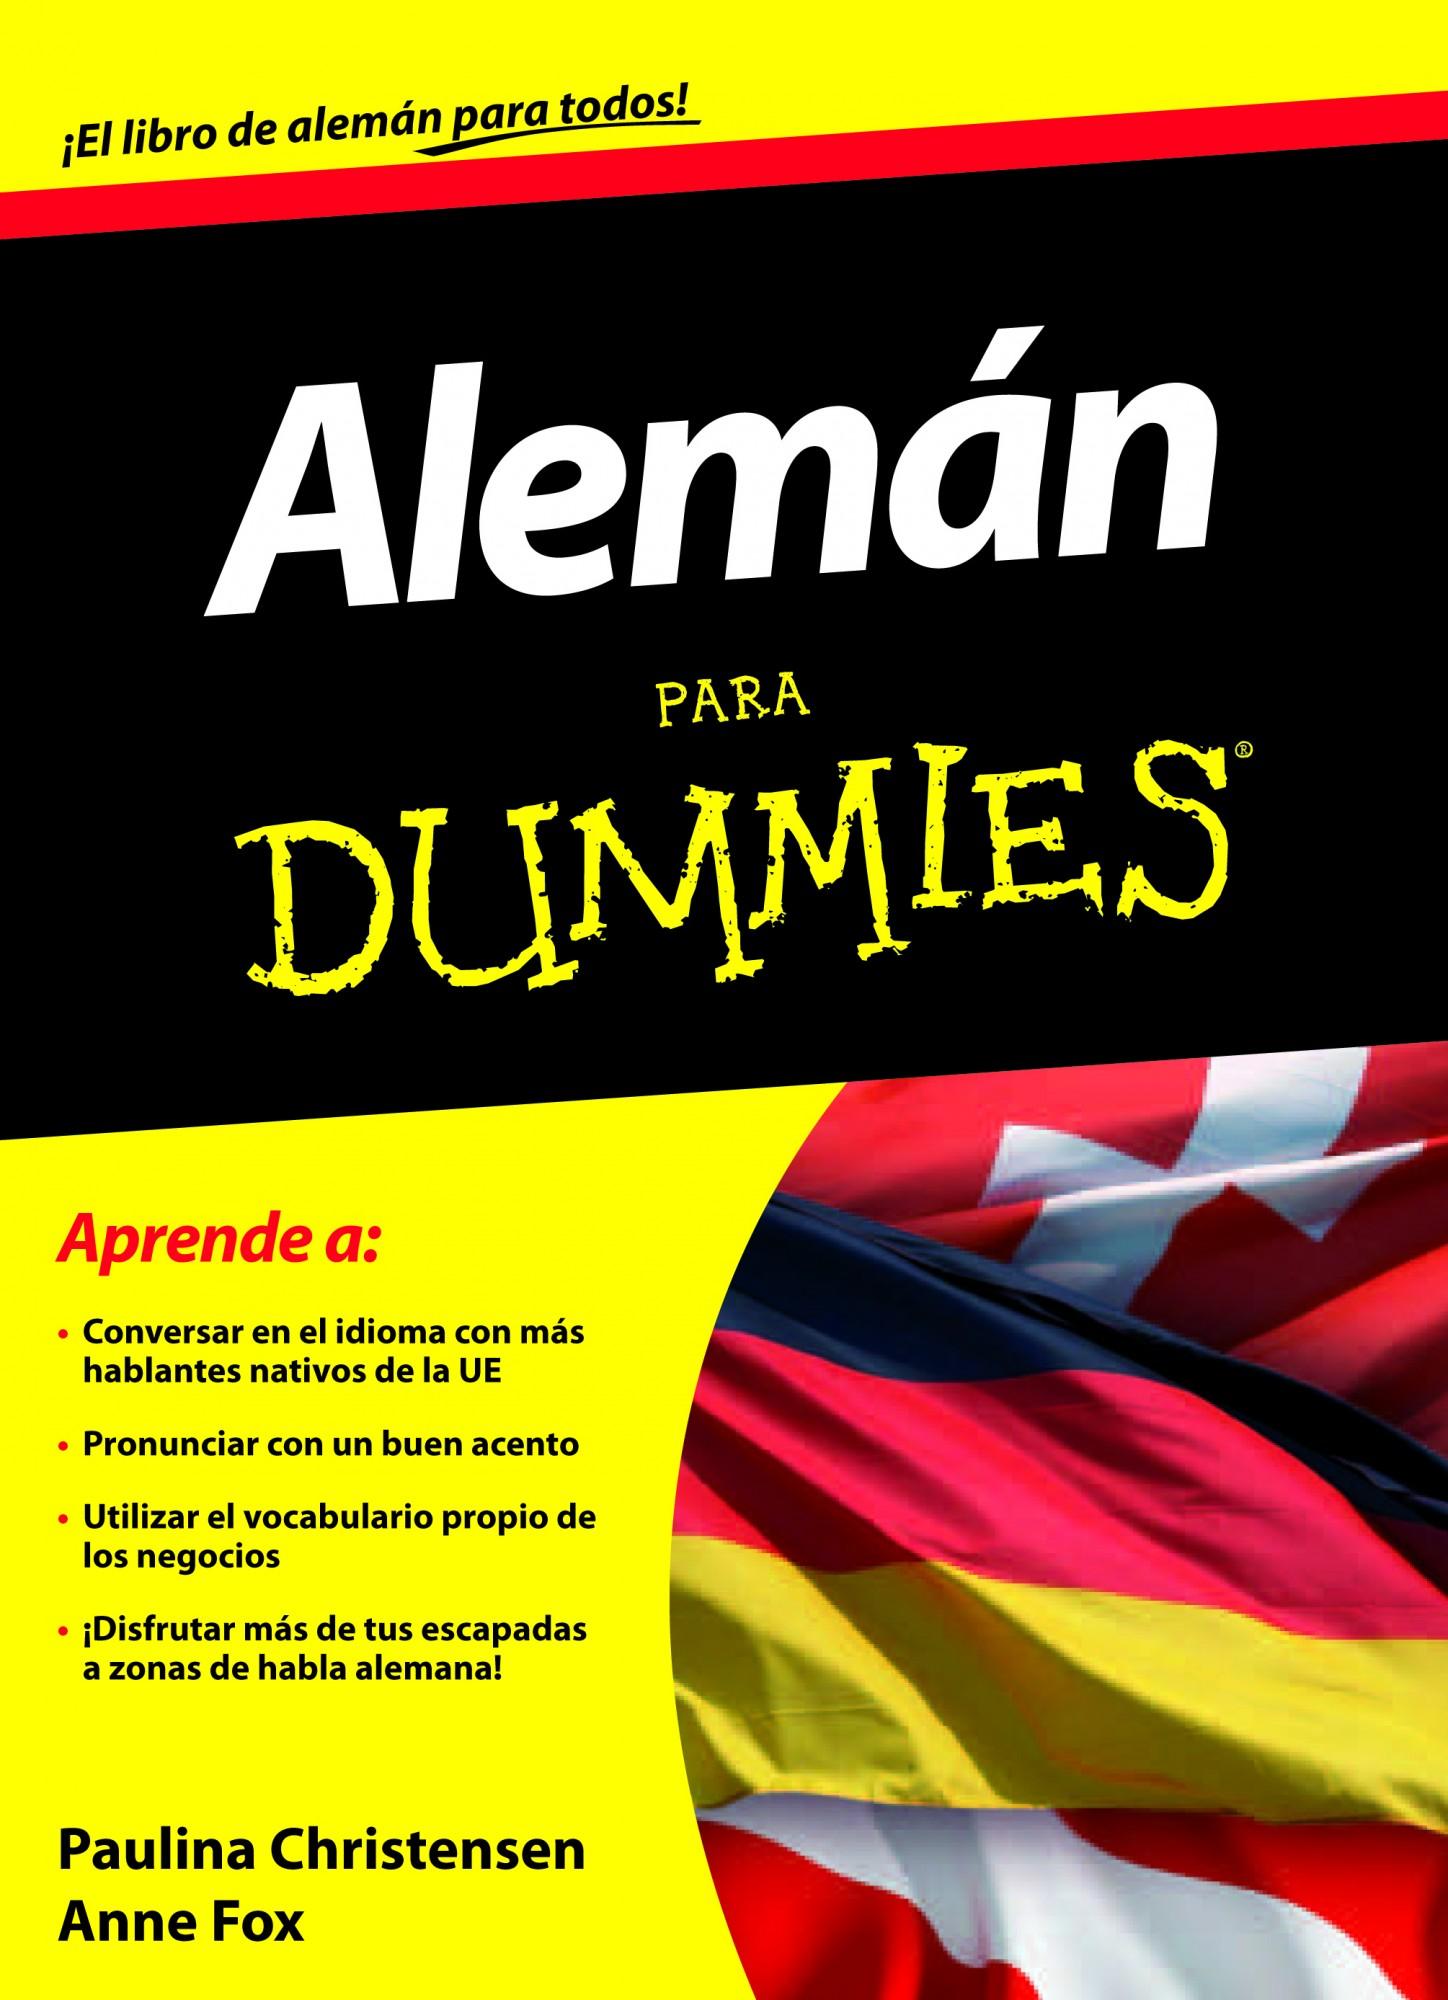 Descargar ALEMAN PARA DUMMIES Epub Mobi PDF Libro @tataya.com.mx